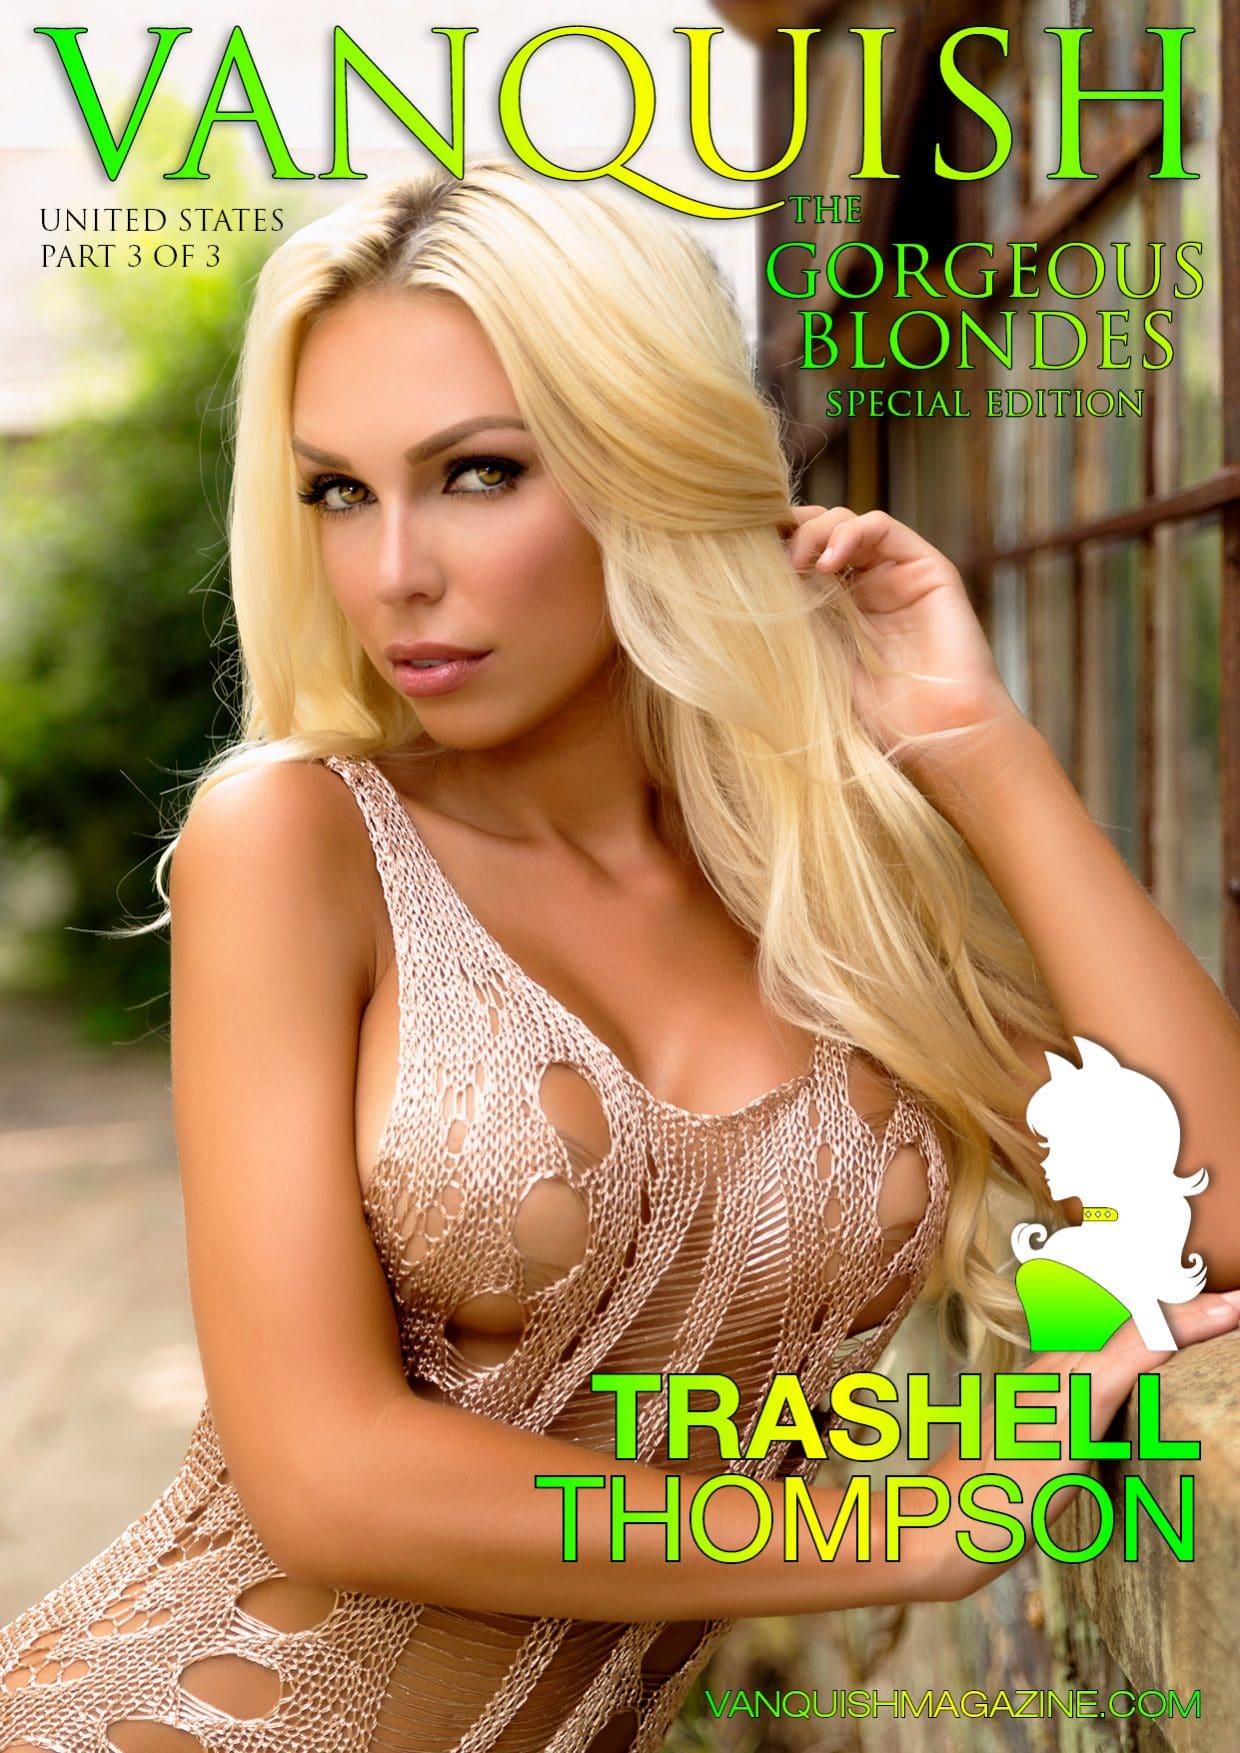 Vanquish Magazine – Gorgeous Blondes – Trashell Thompson